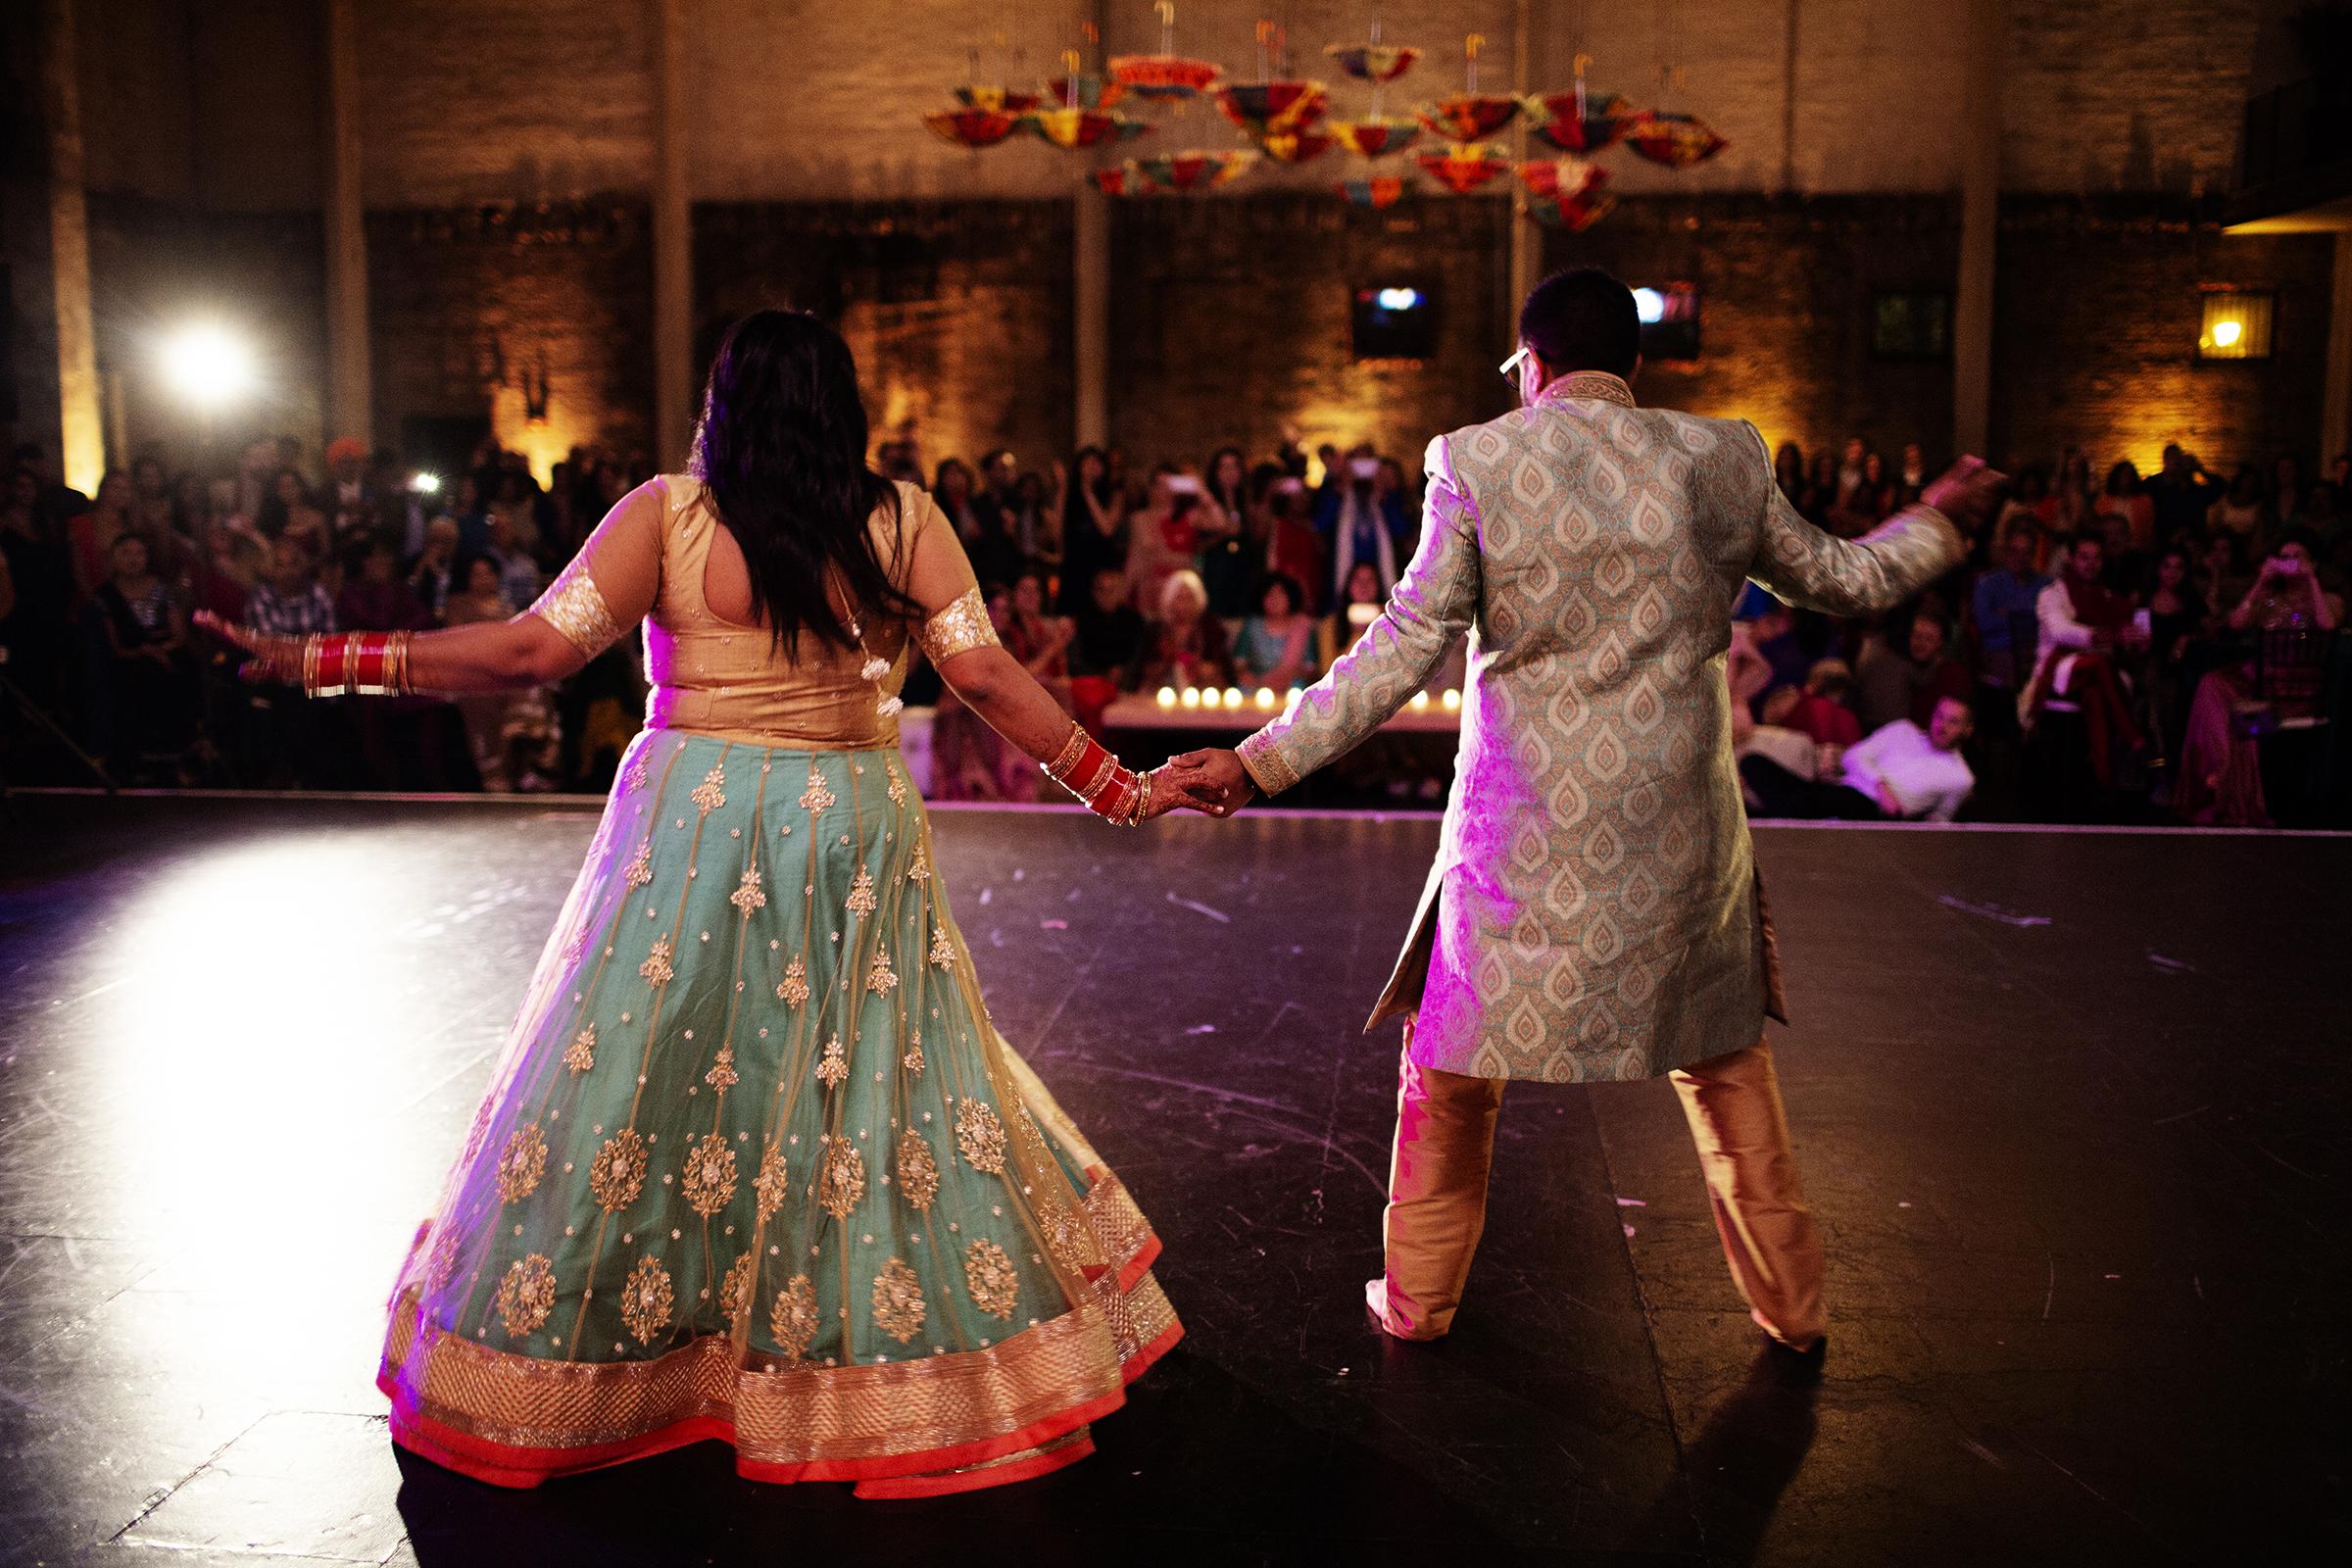 Aria Event Center Sangeet   Minneapolis Wedding Photos   Photography by Photogen Inc.   Eliesa Johnson   Luxury Wedding Photography Based in Minnesota